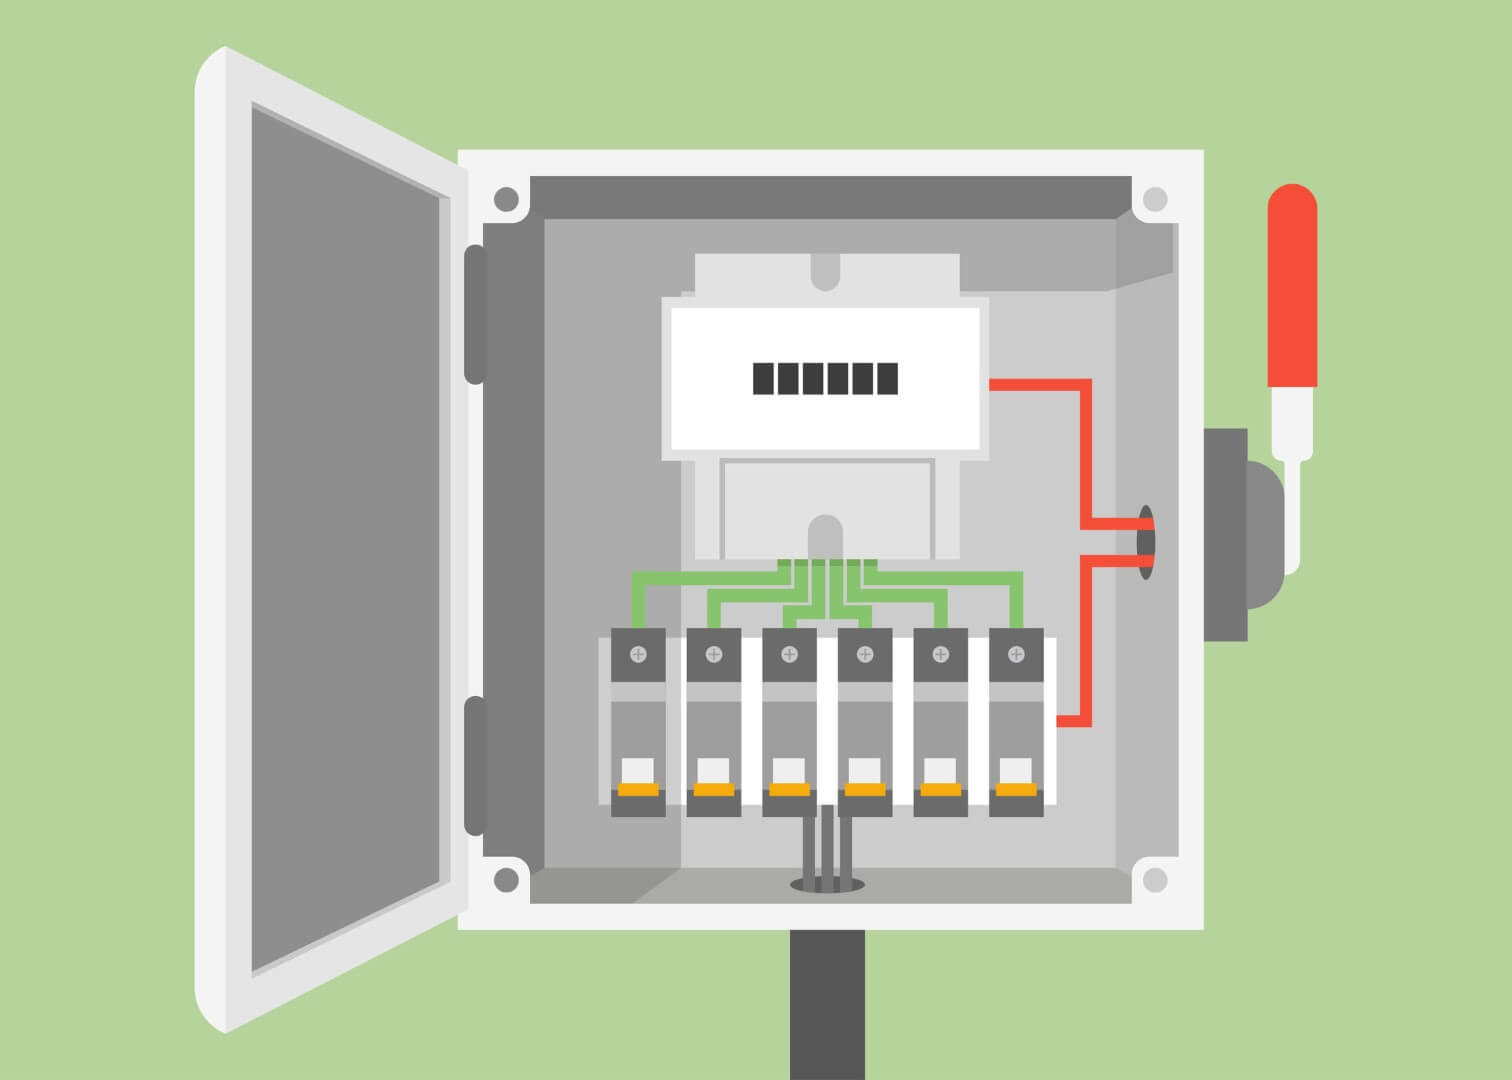 circuit breaker illustration